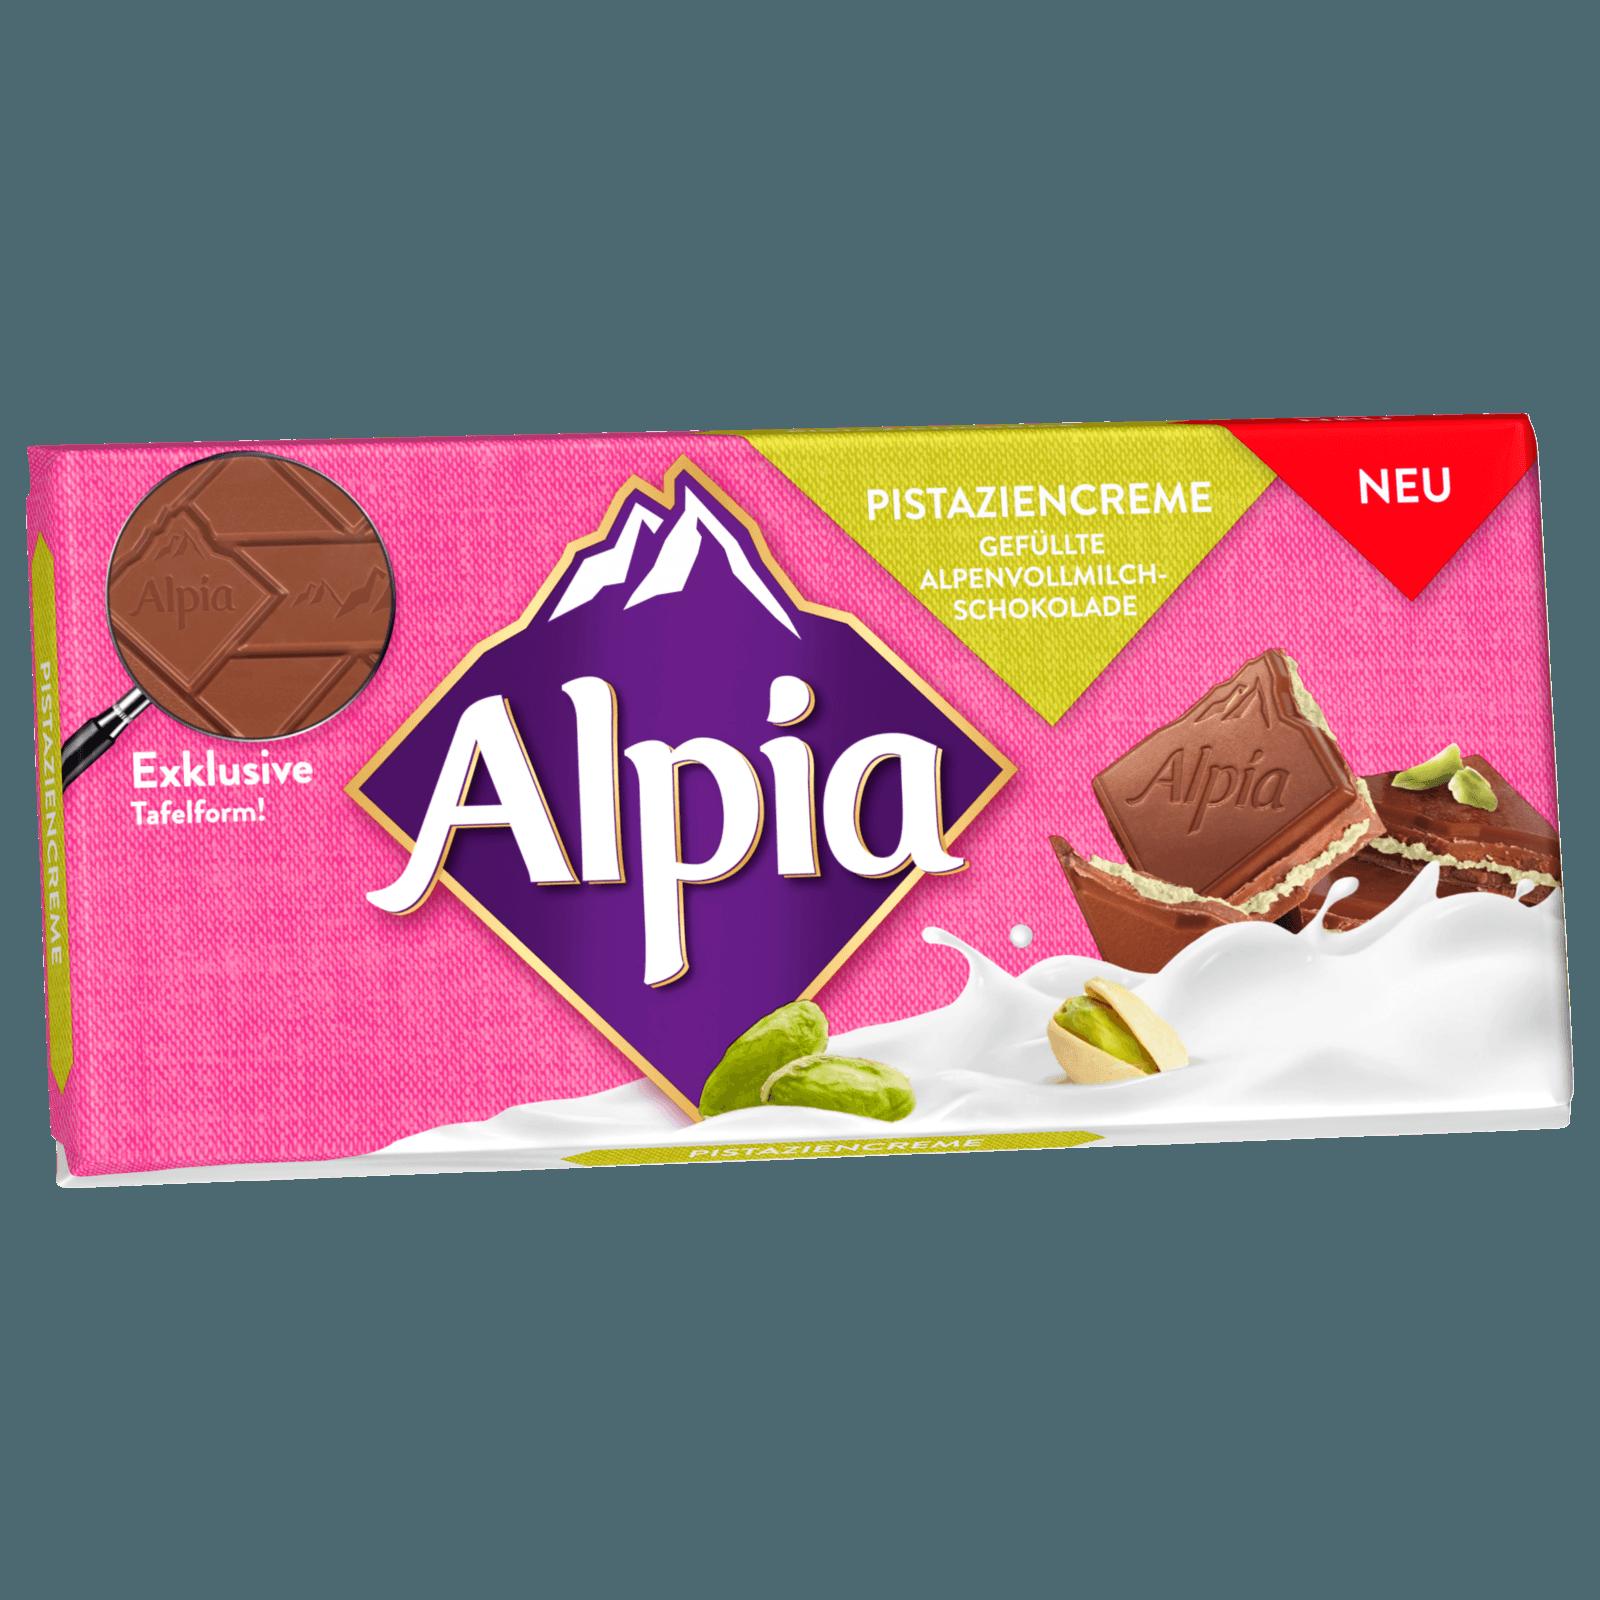 Alpia Pistaziencreme 100g